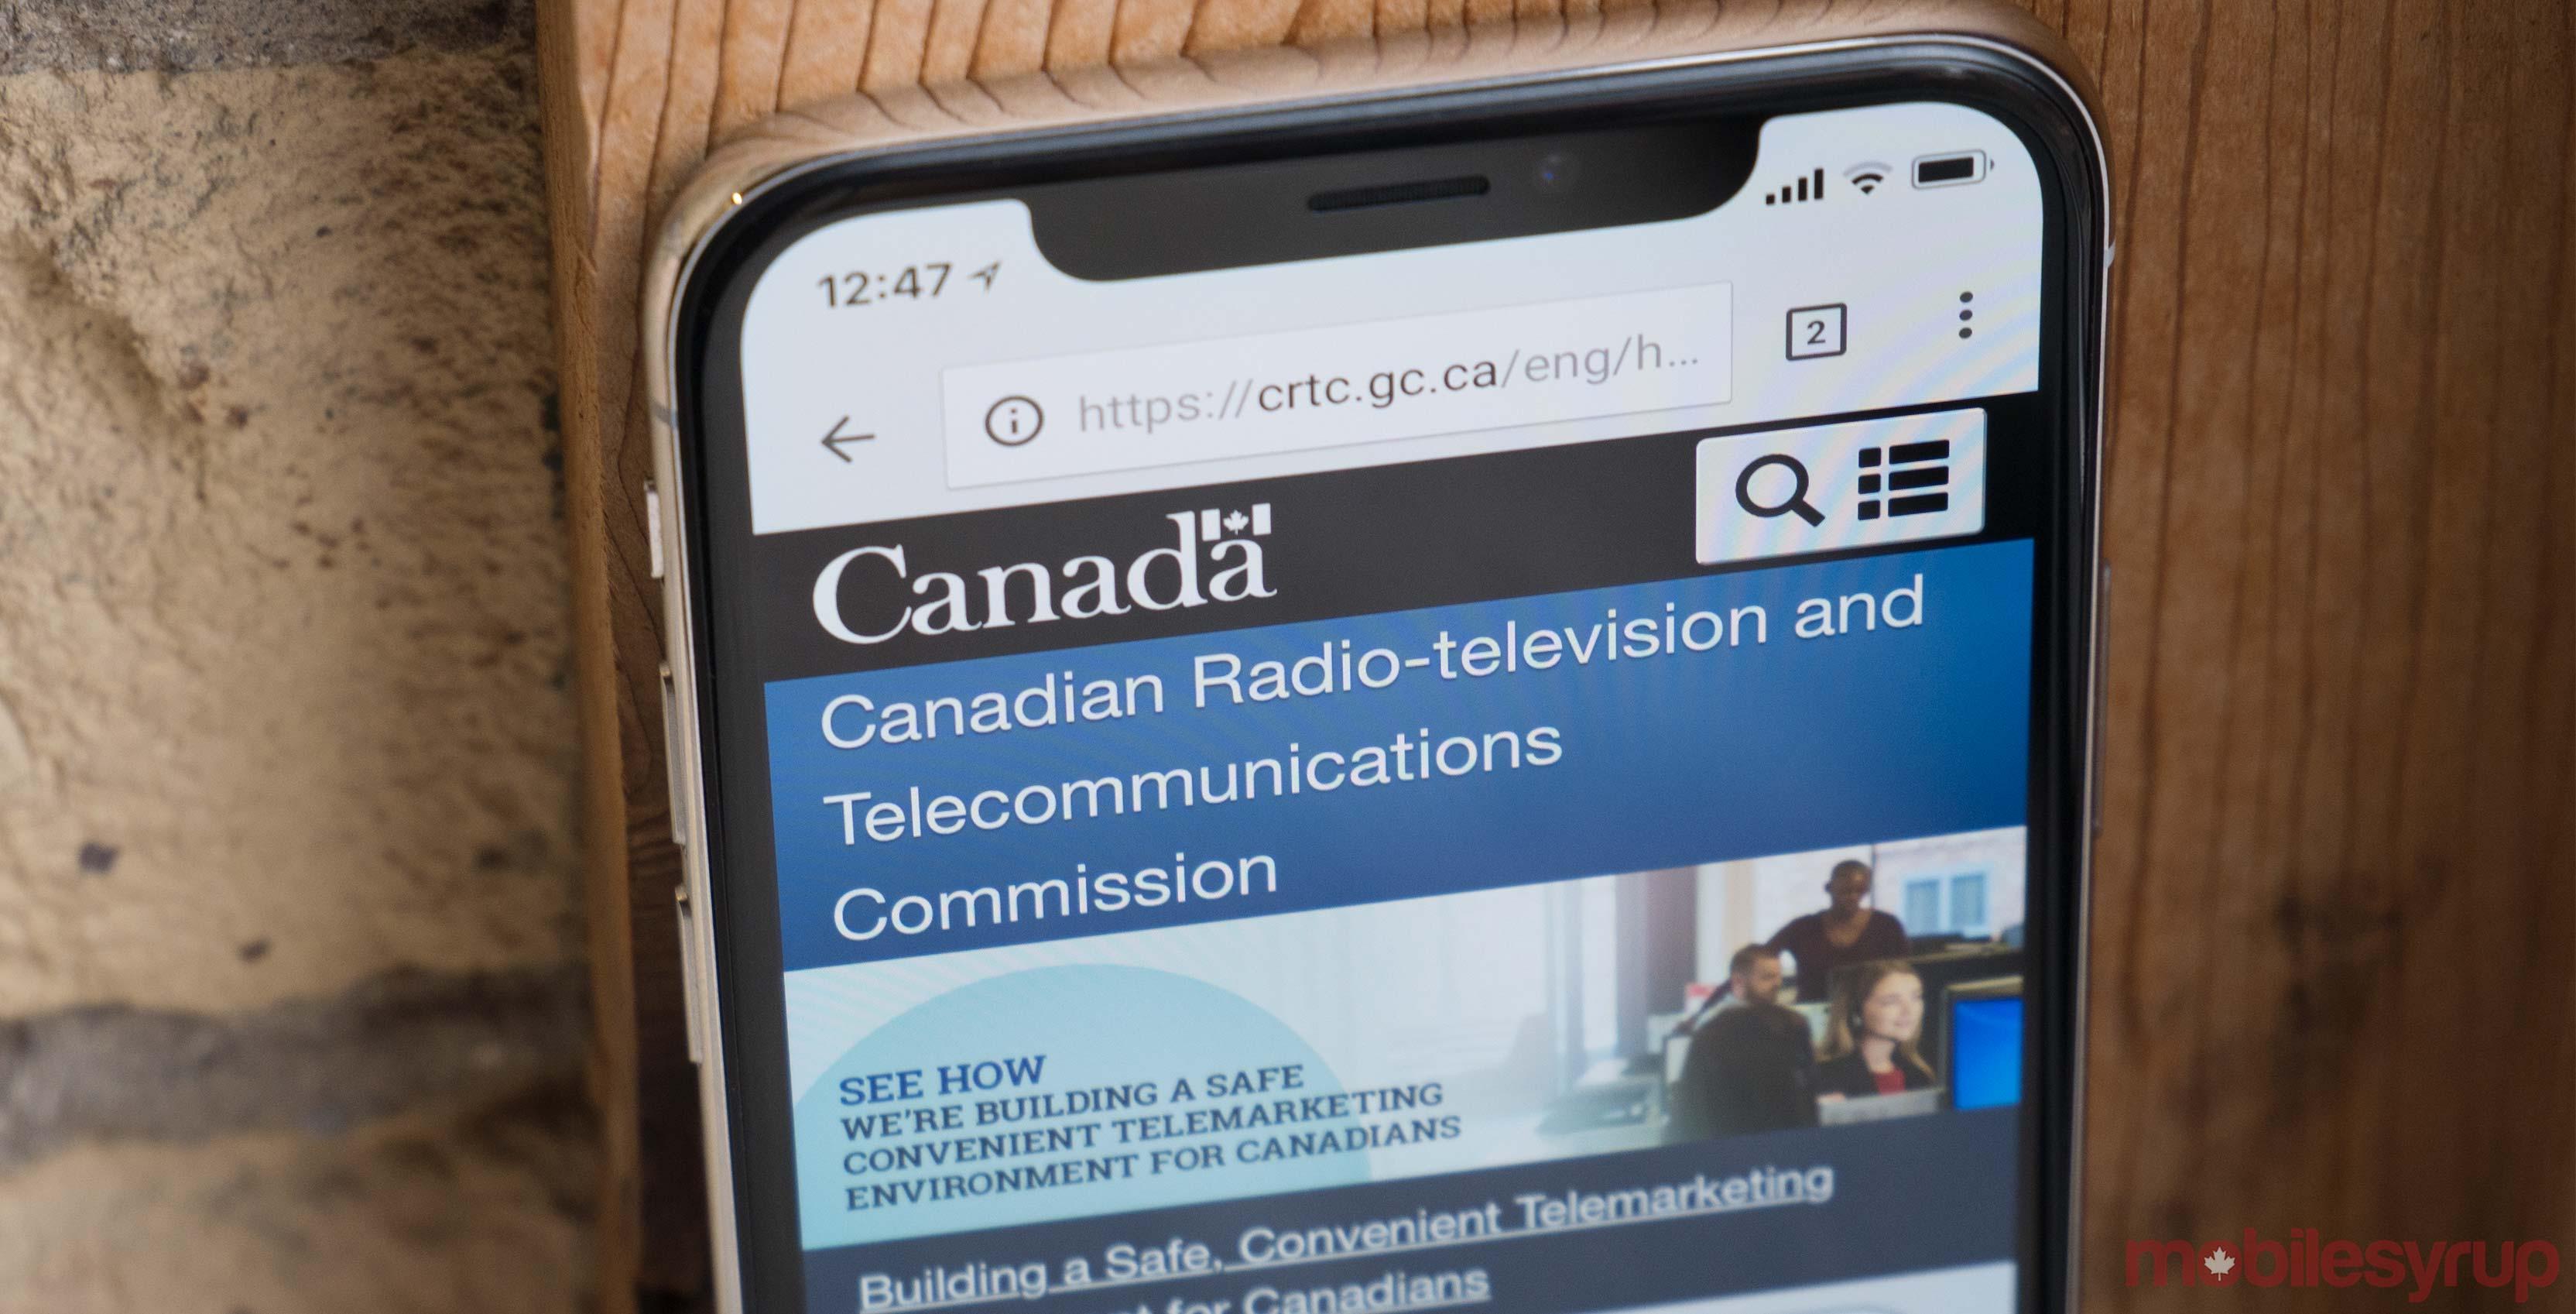 CRTC website on an iPhone X